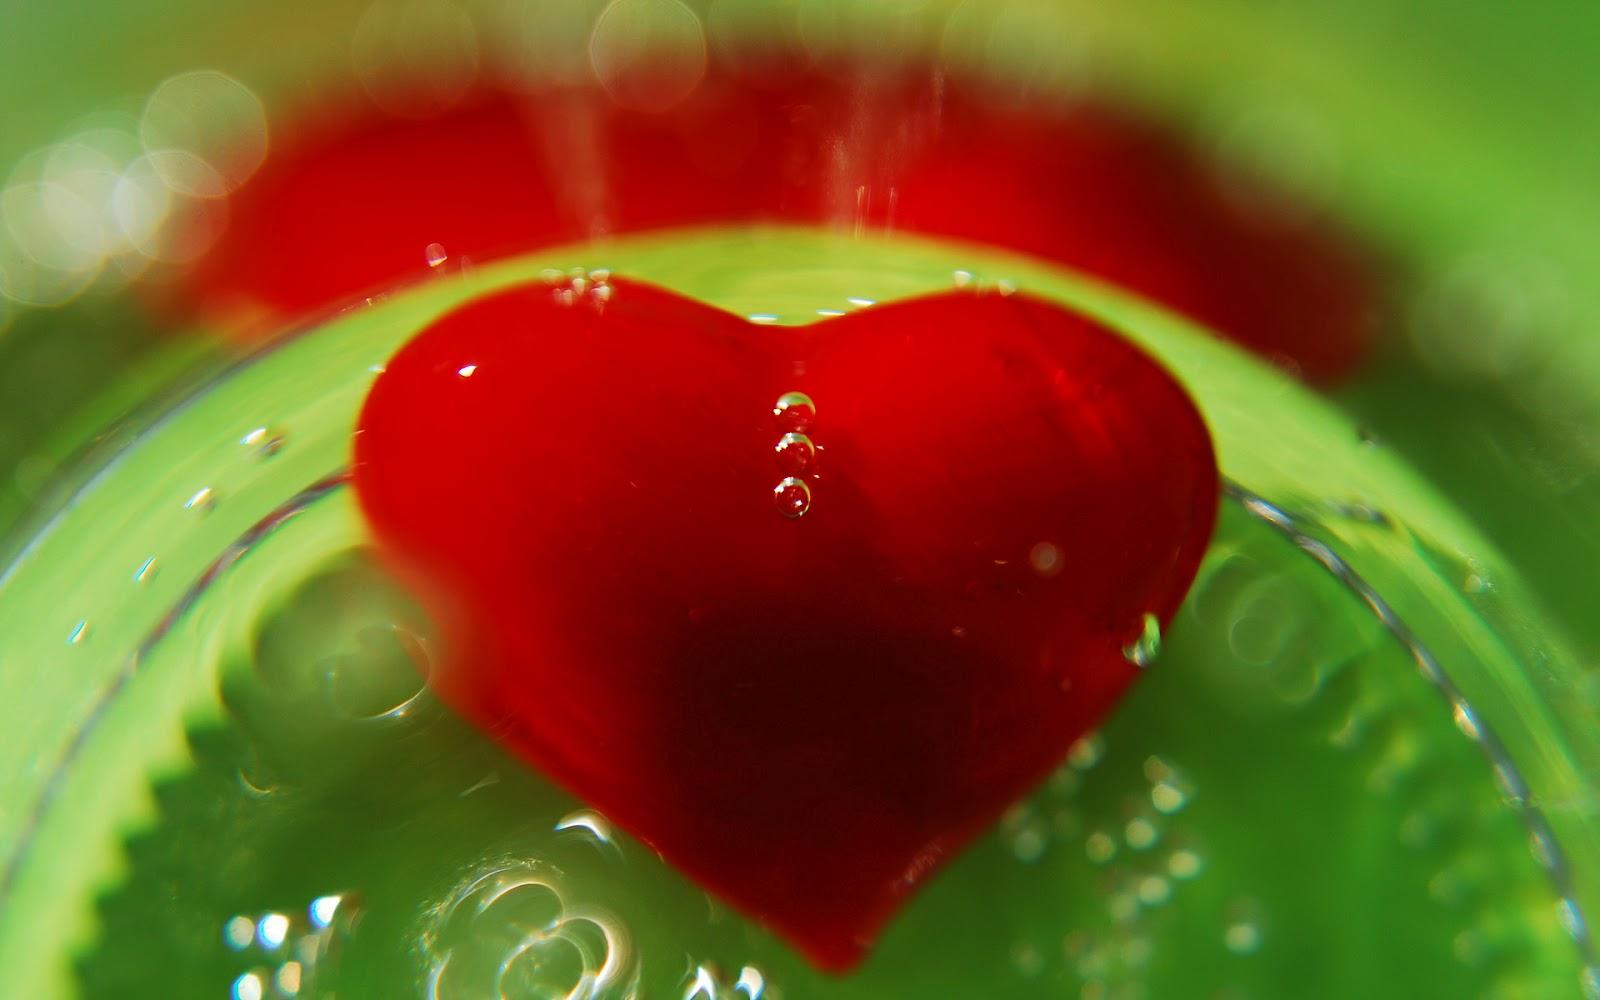 Top 20 R Wallpaper Love: Top 29 Beautiful Love Heart Wallpapers In HD